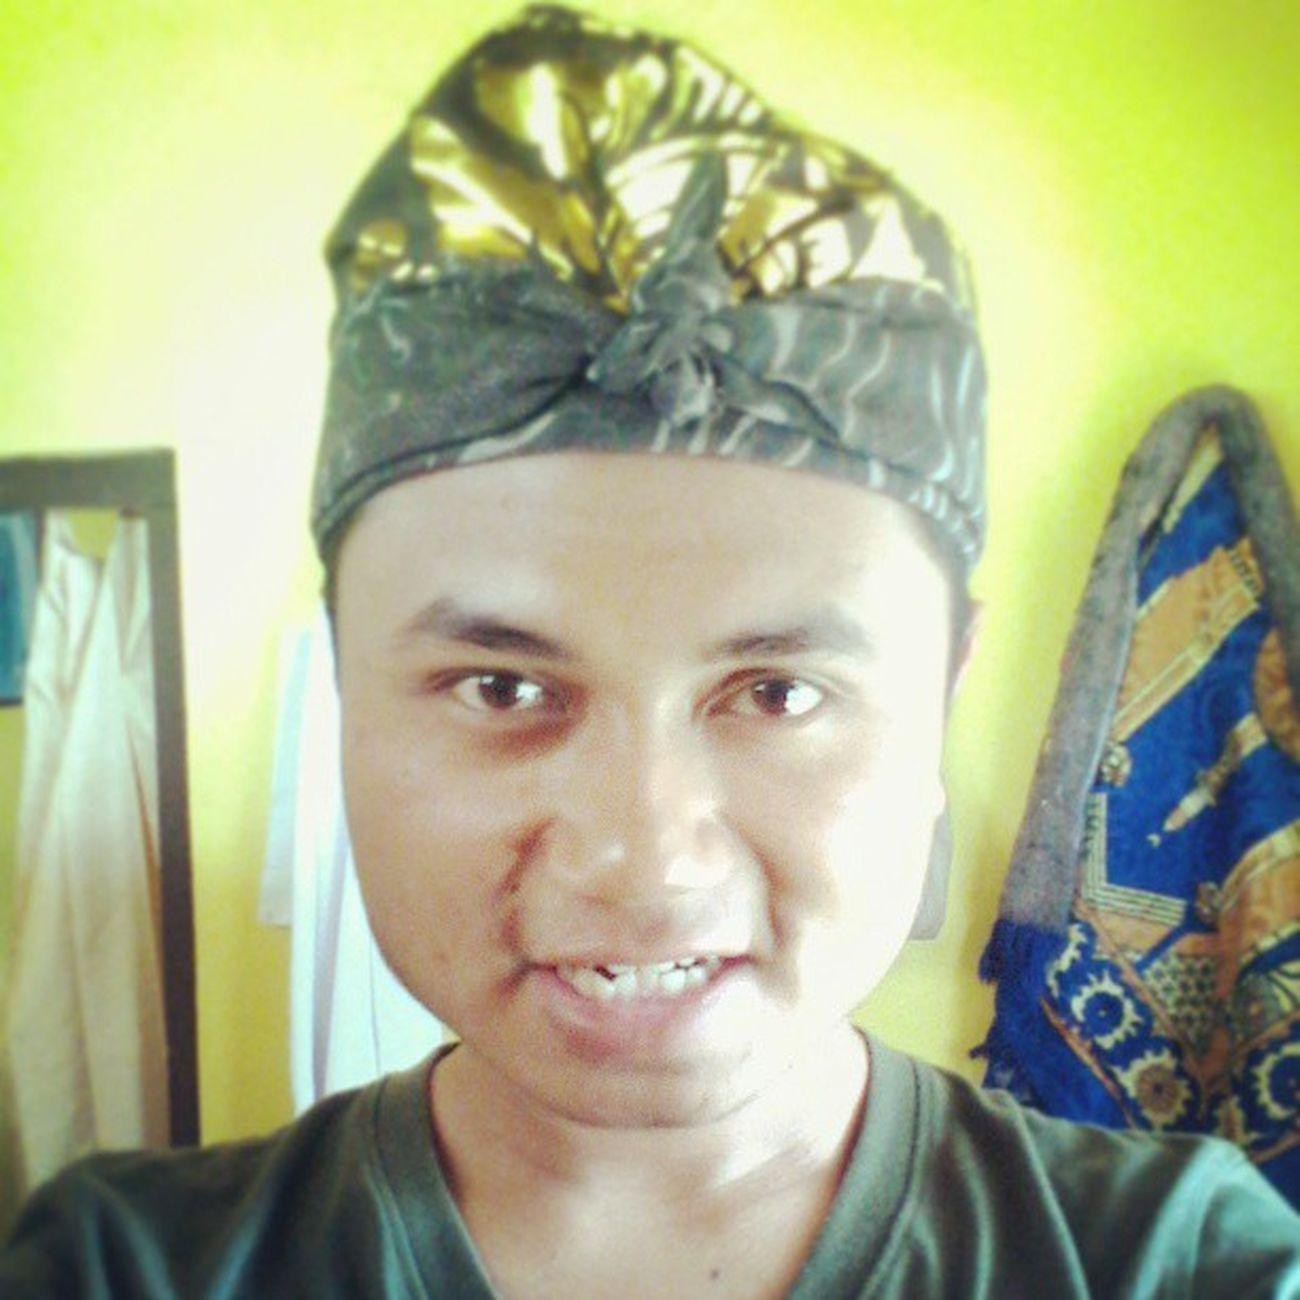 Bali Style Udeng Bali Instabali Instanusantara instaindonesia yellow gold brown instagram webstagram picoftheday photosoftheday igers tbt igersworldwide instaandro ragamindonesia bestoftheday